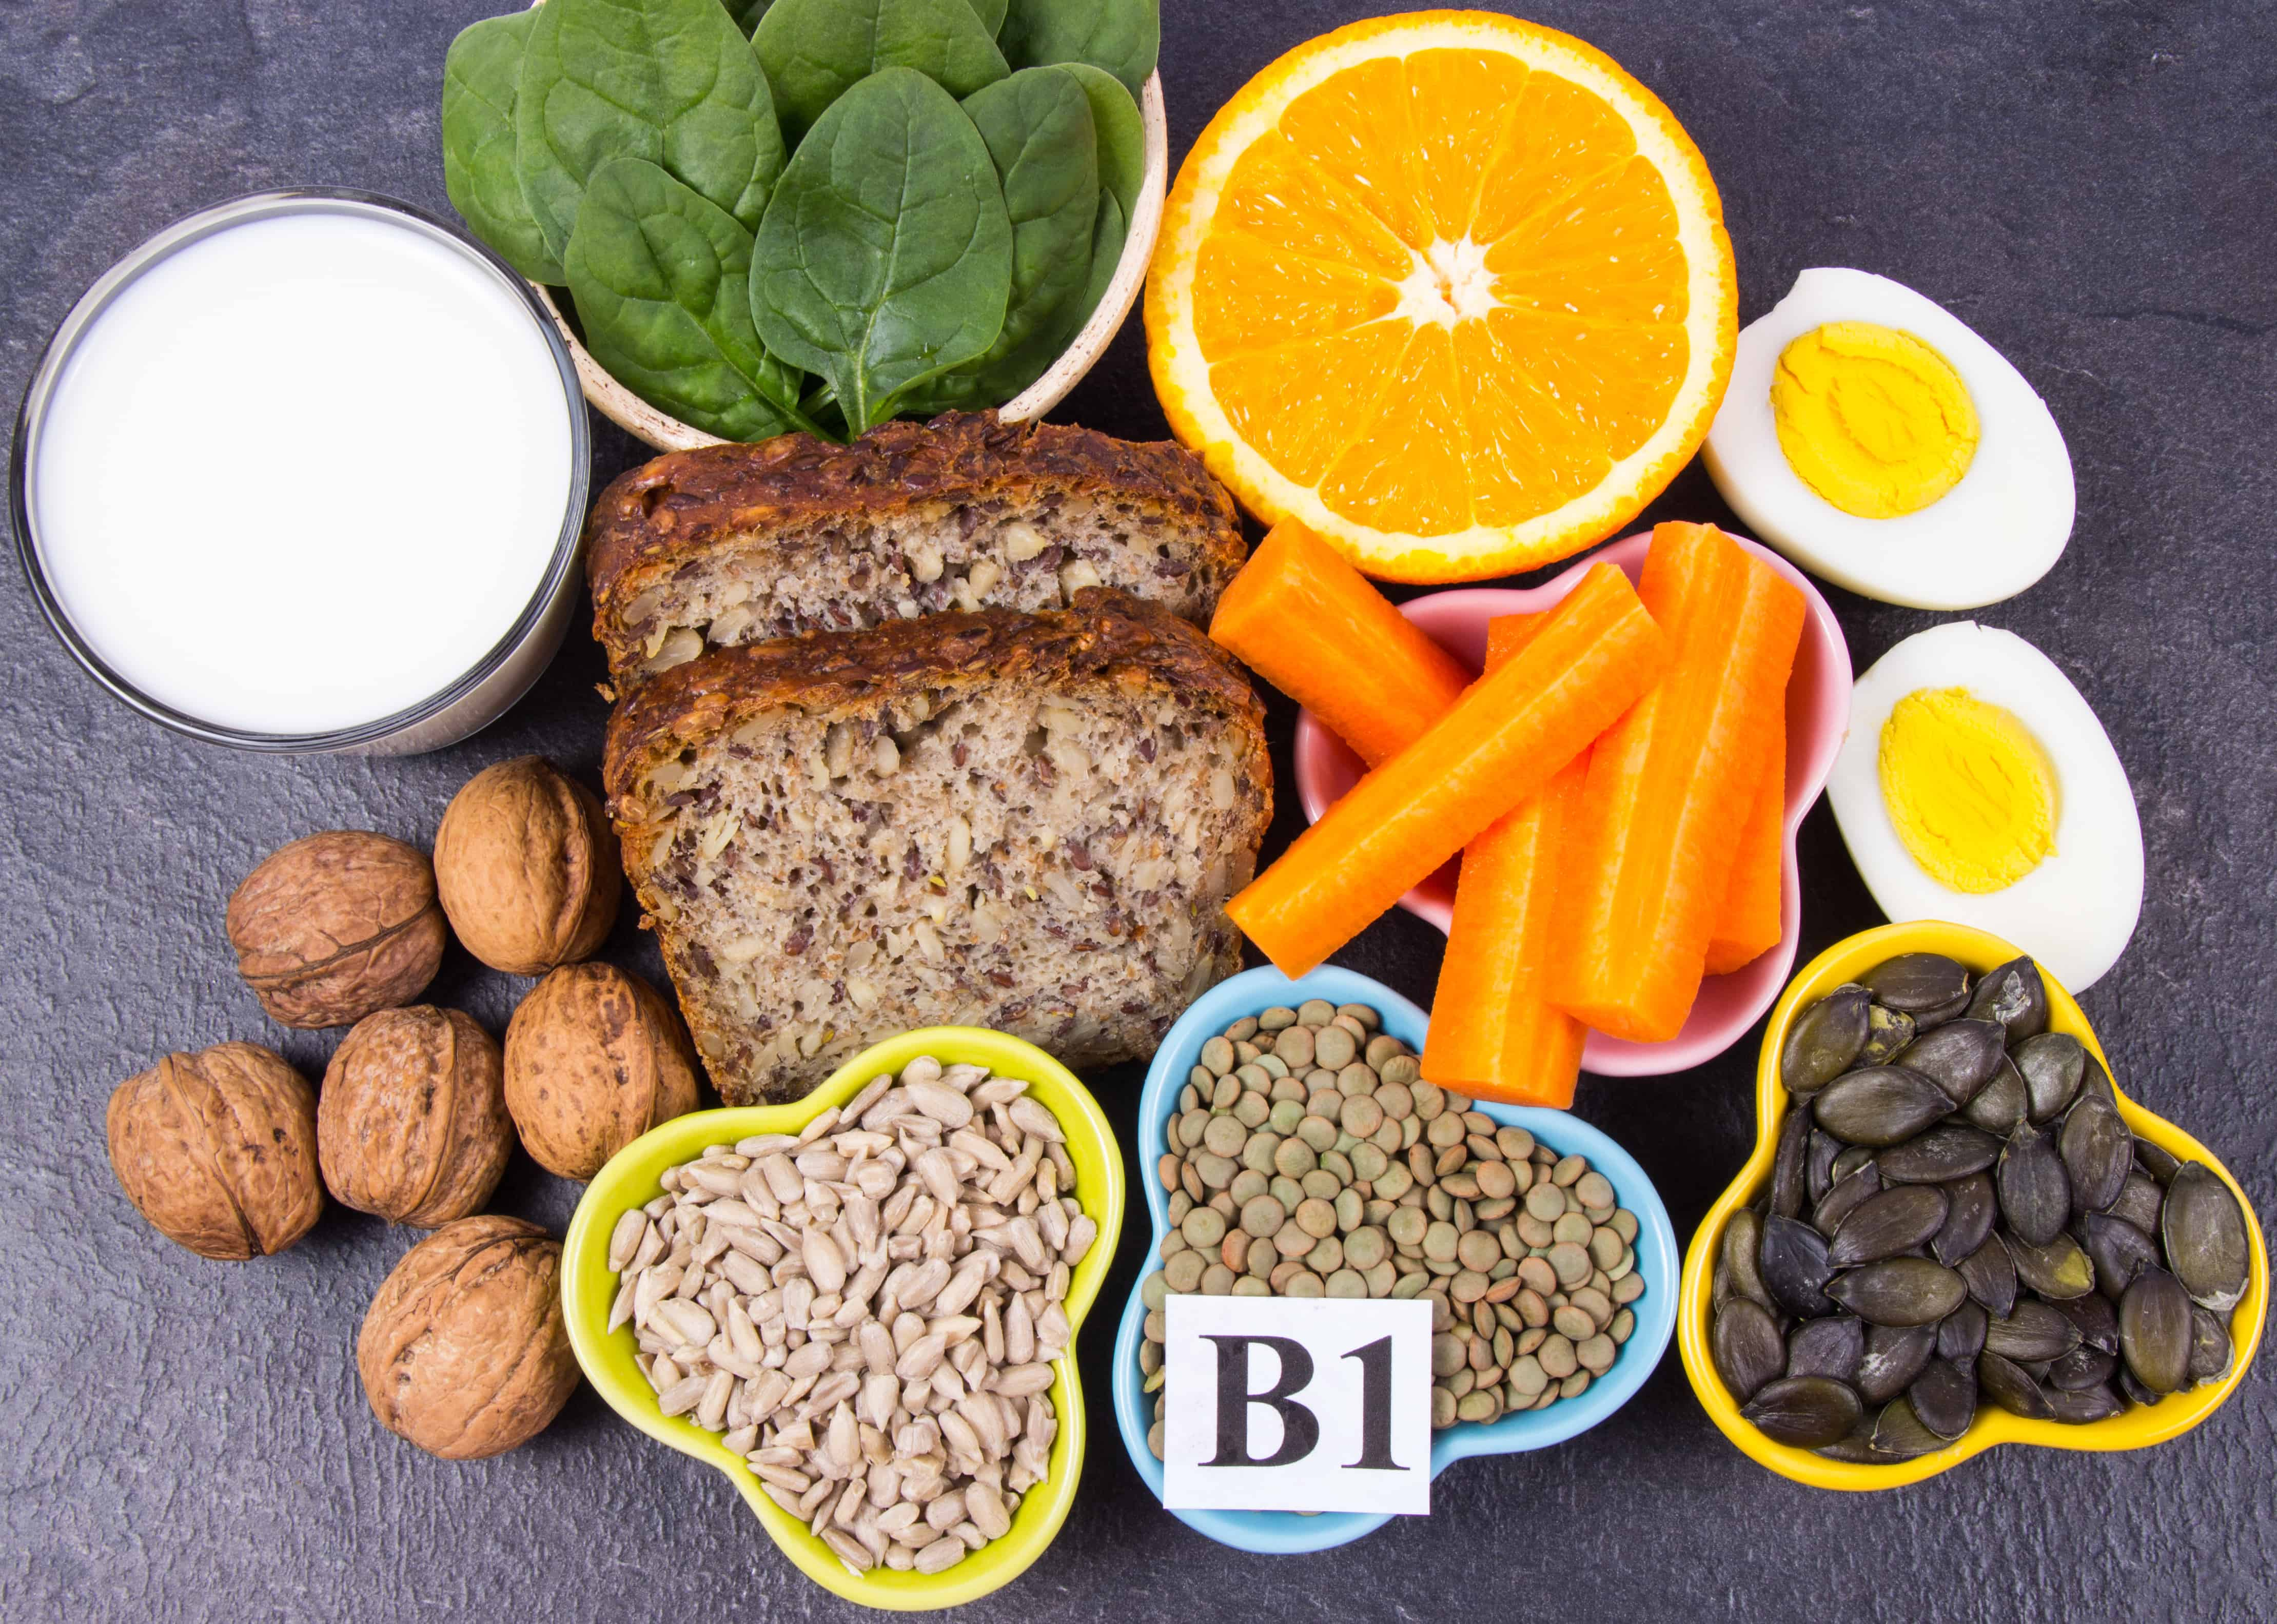 es malo tener alta la vitamina b12